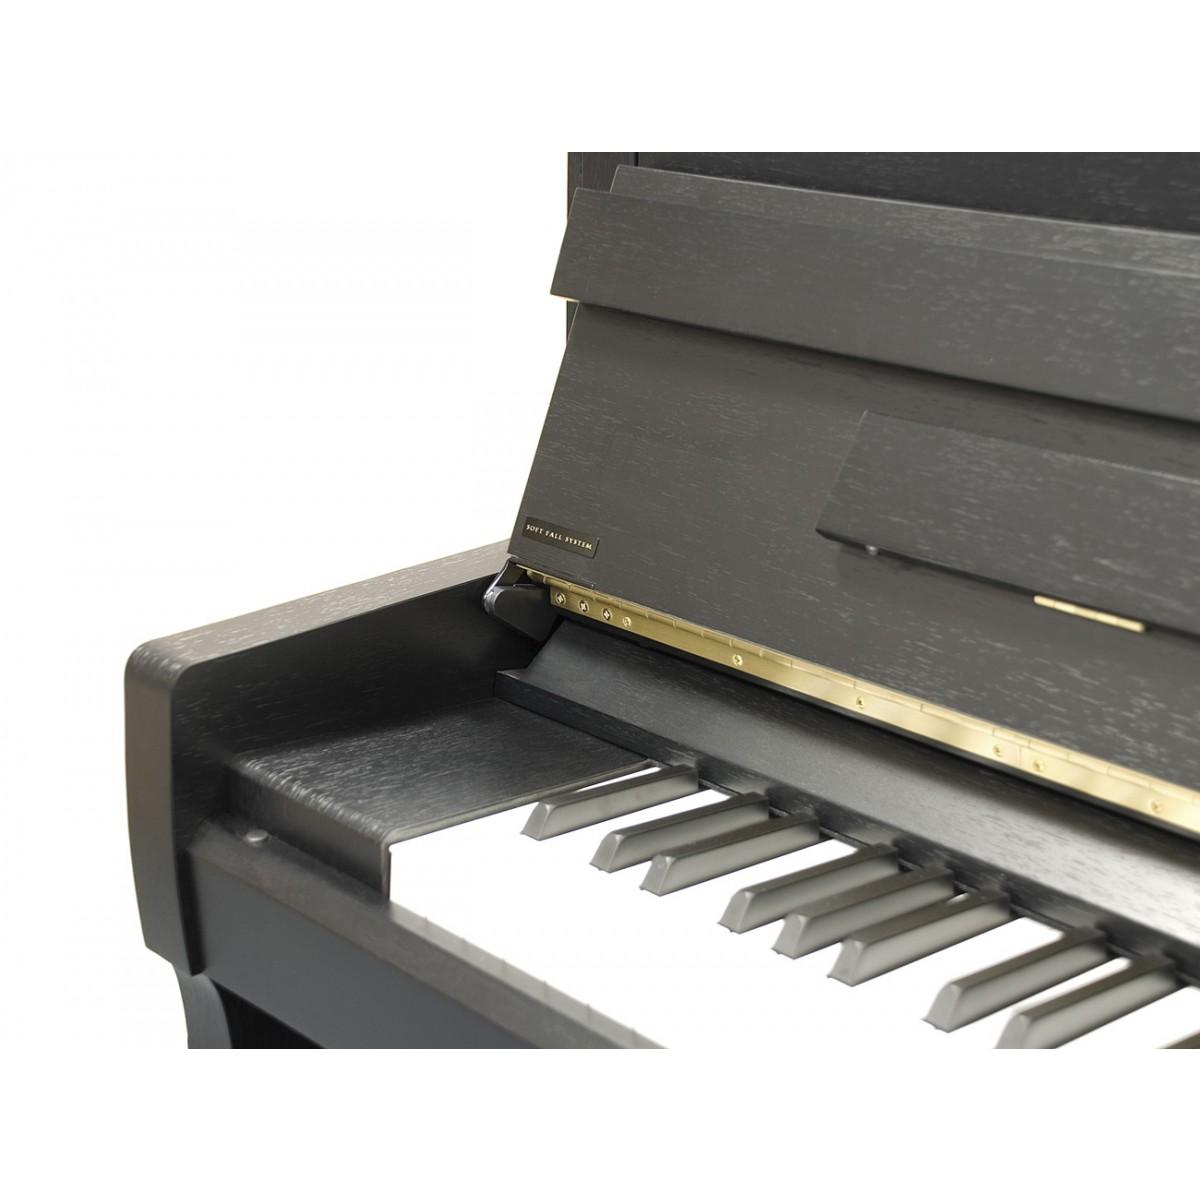 Kawai Klavier schwarz matt, K200/E200